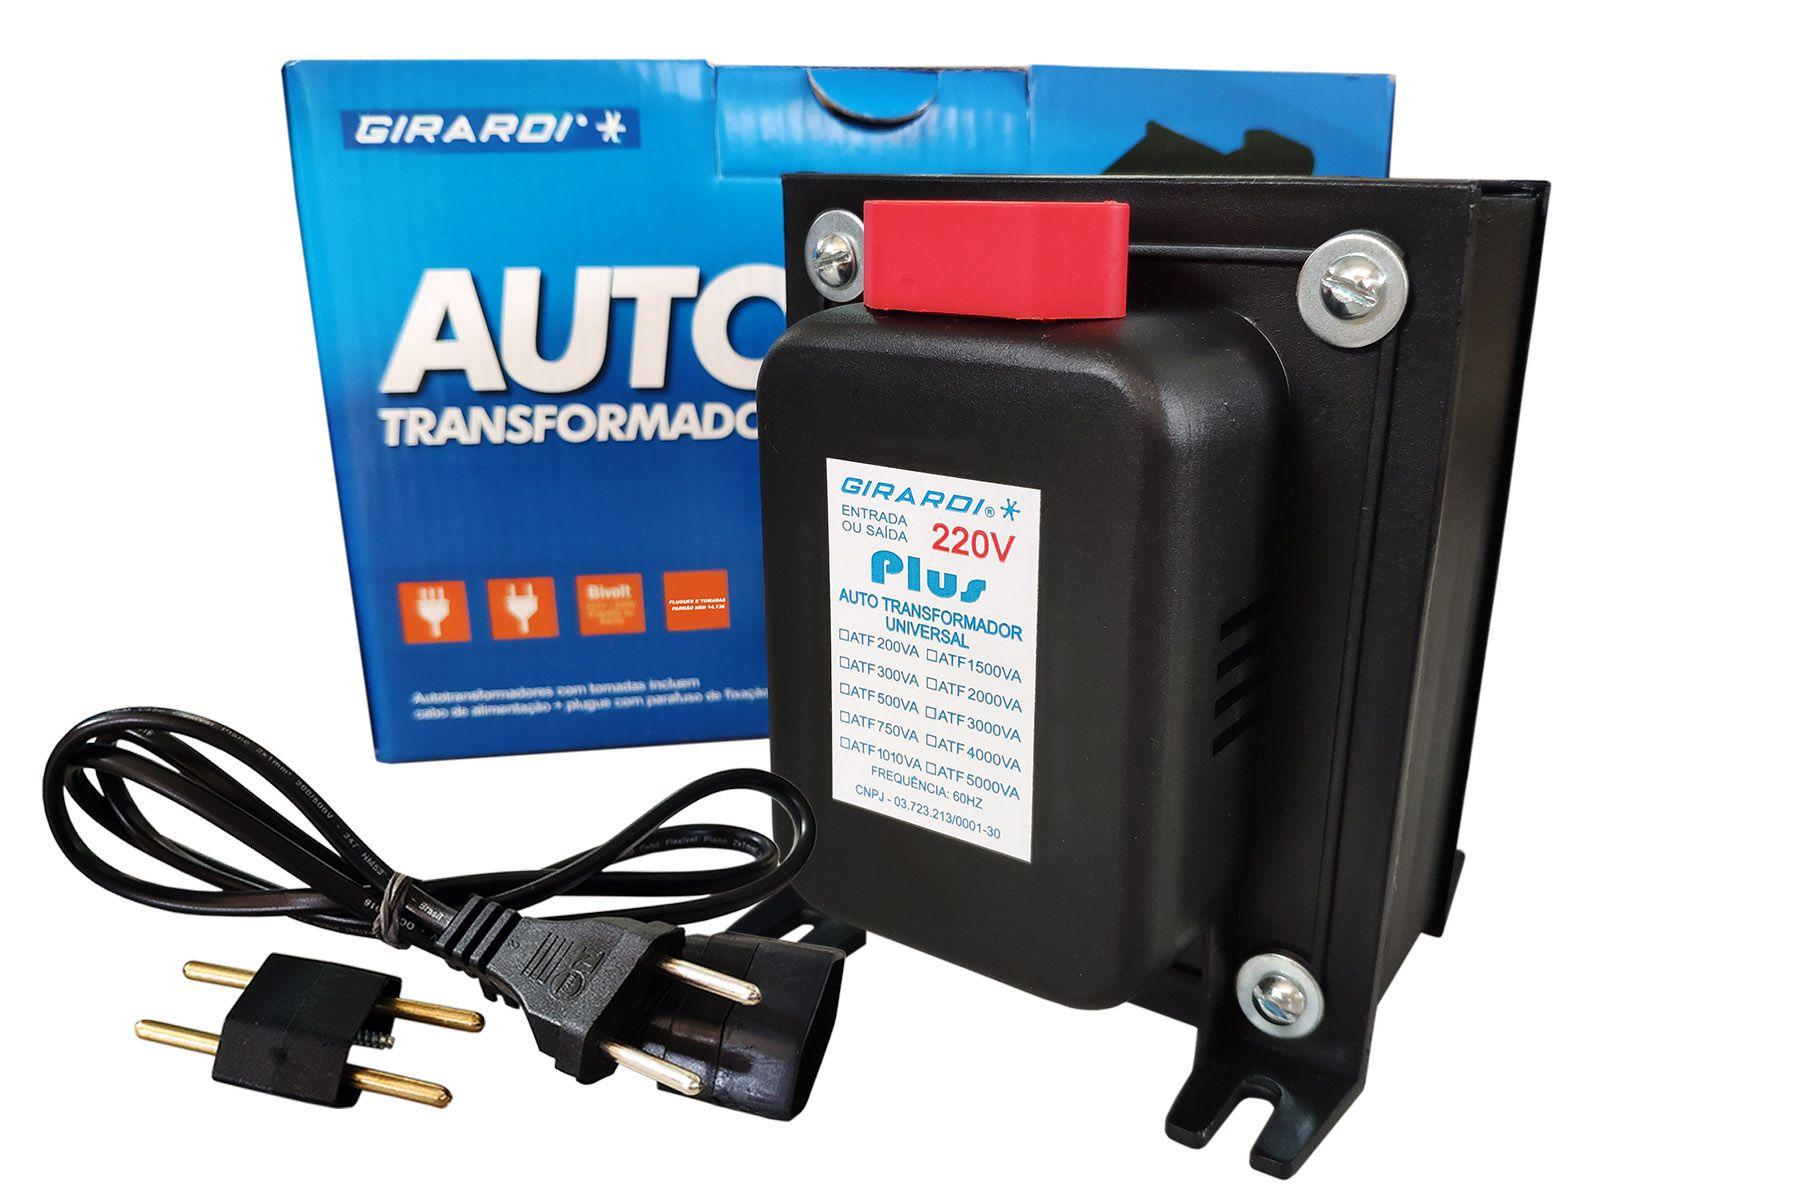 Autotransformador 3000 VA Plus 127 / 220 V e 220 / 127 V GIRARDI